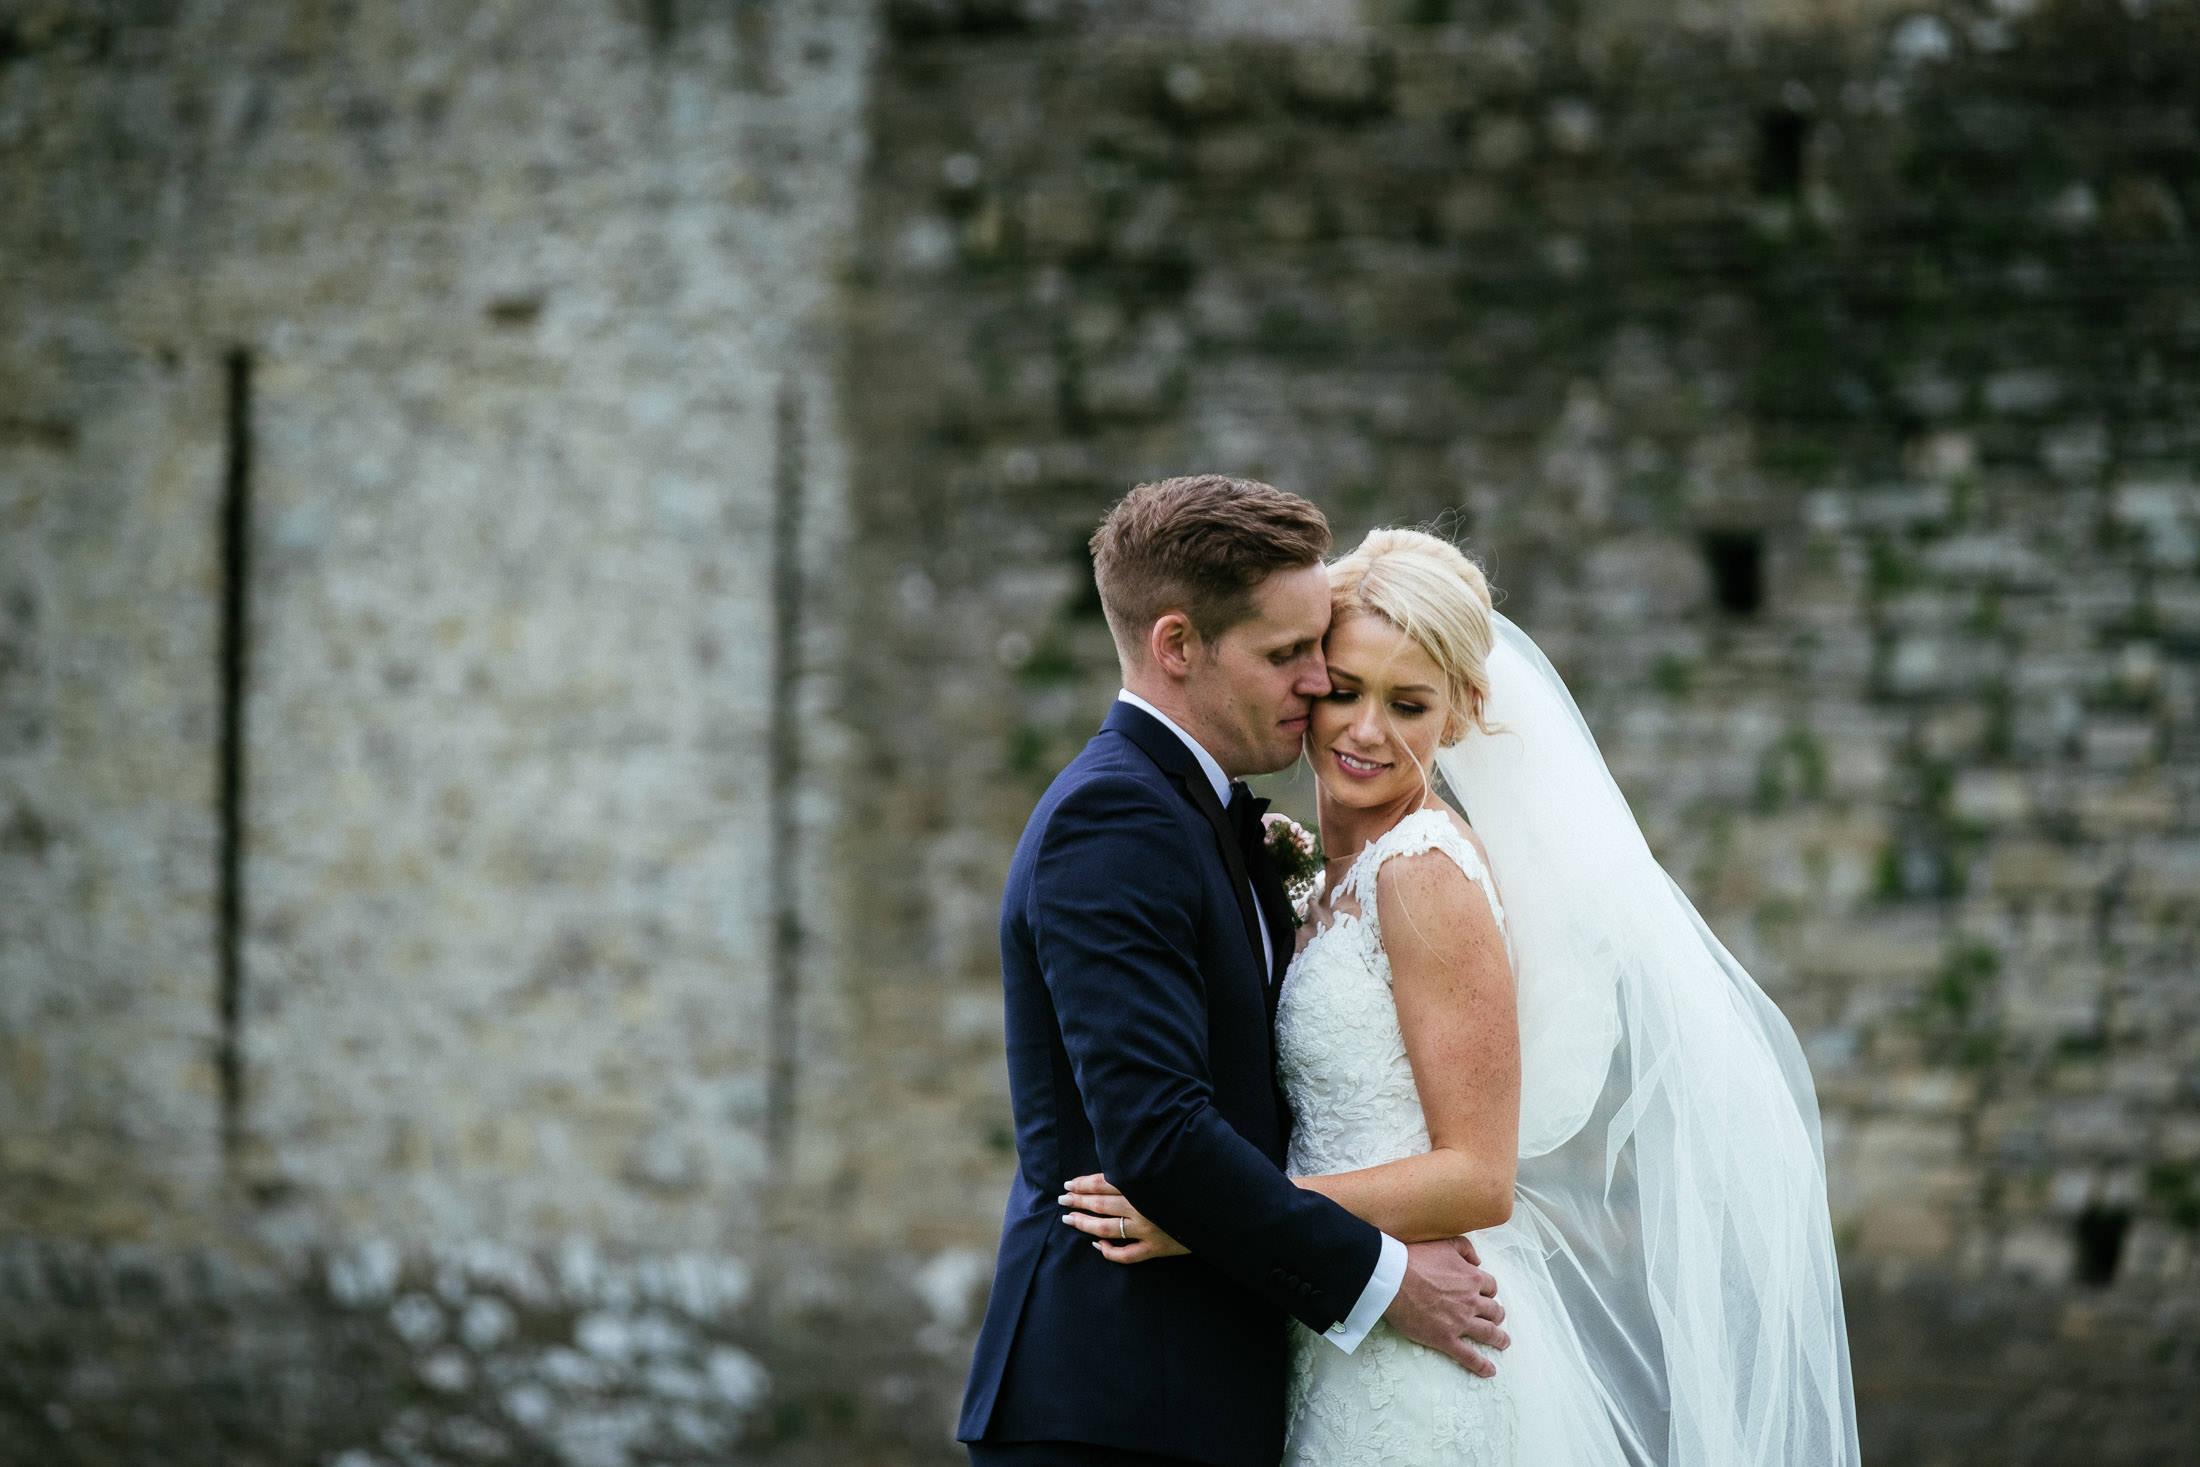 Knightsbrook Hotel Trim Castle Wedding Photographer 83